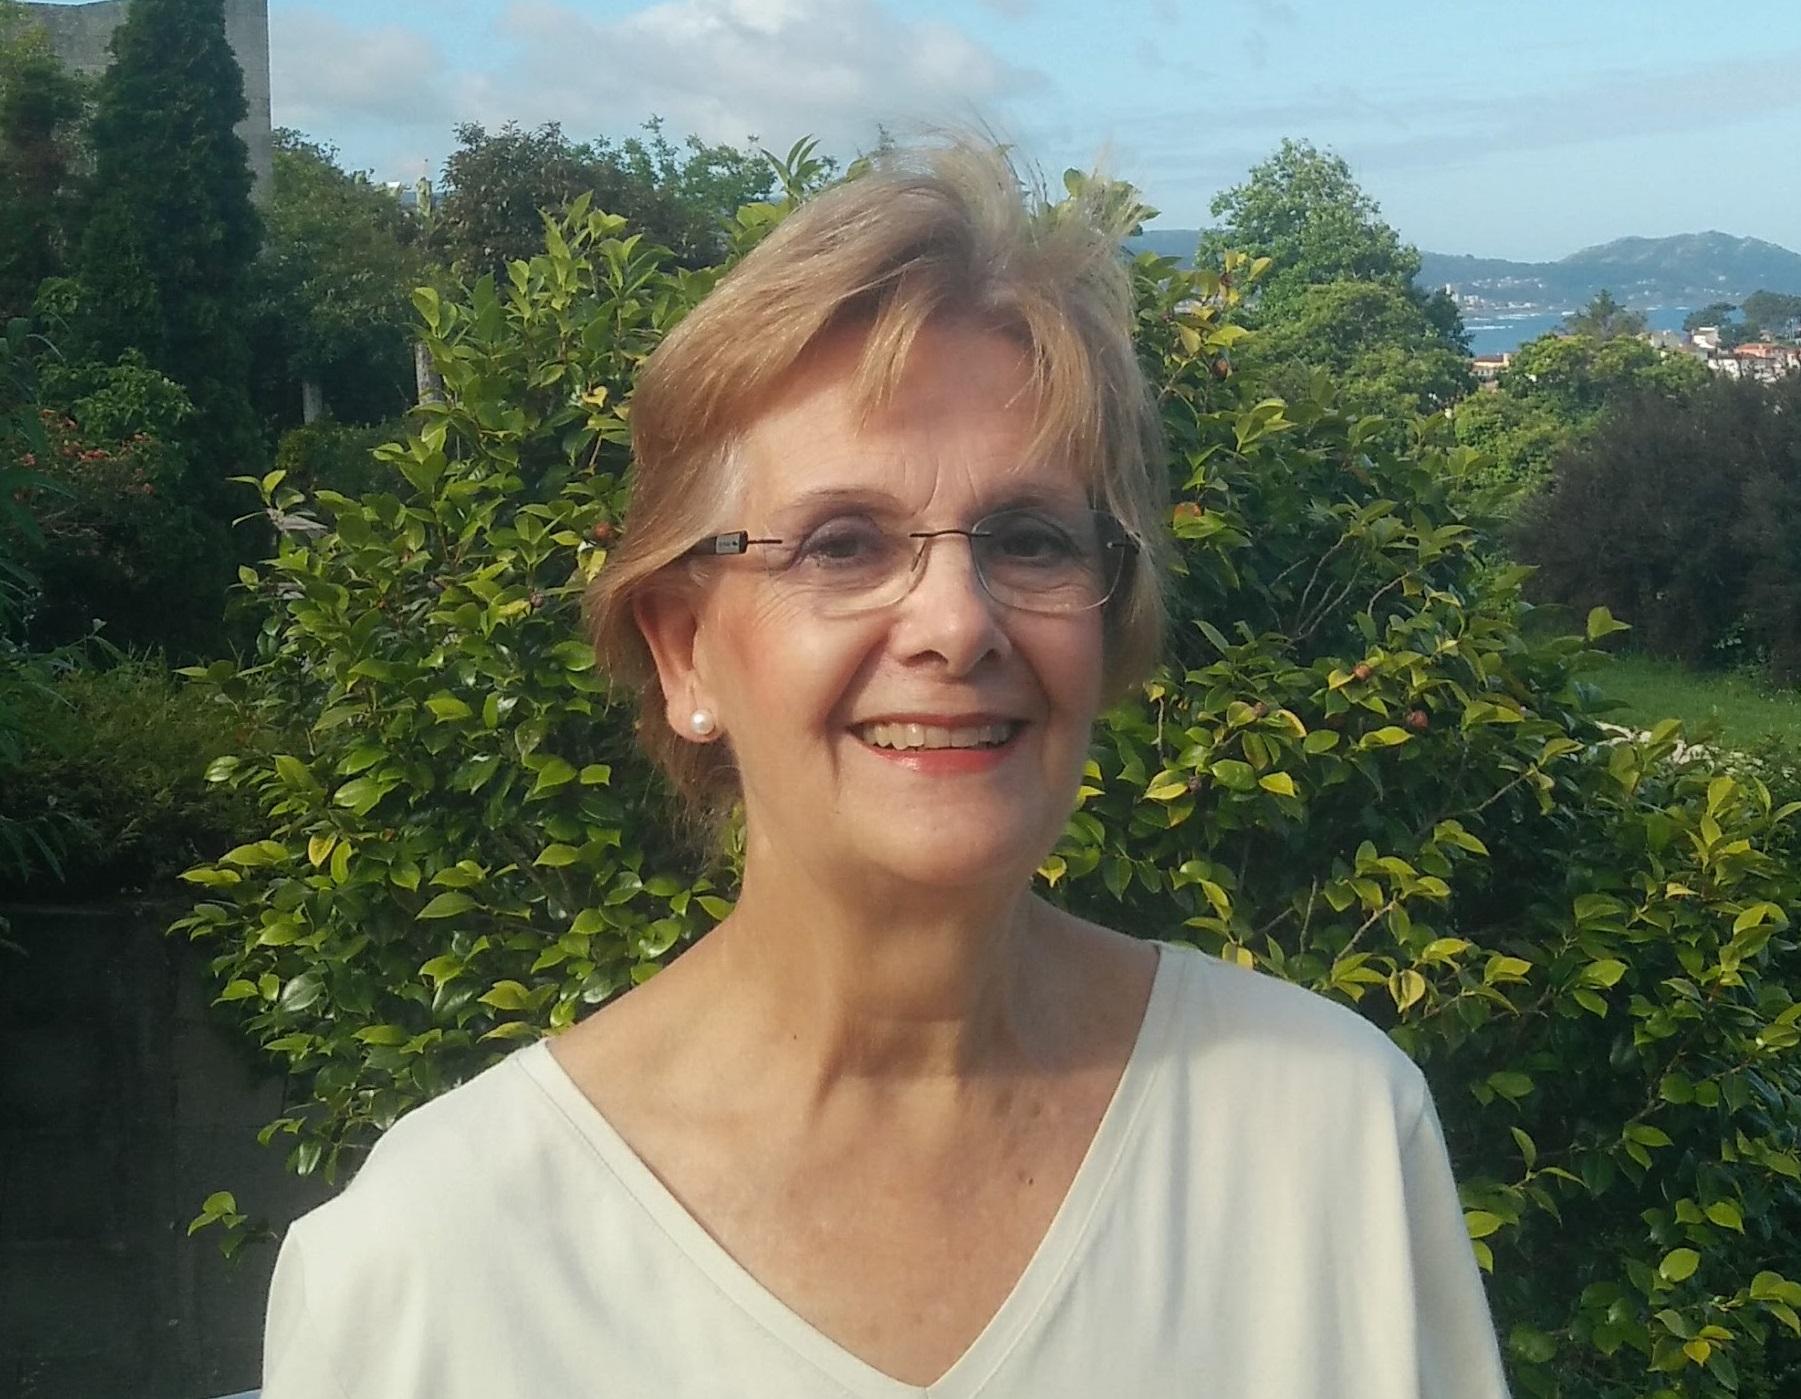 Mª LUÍSA IRISARRI CASTRO